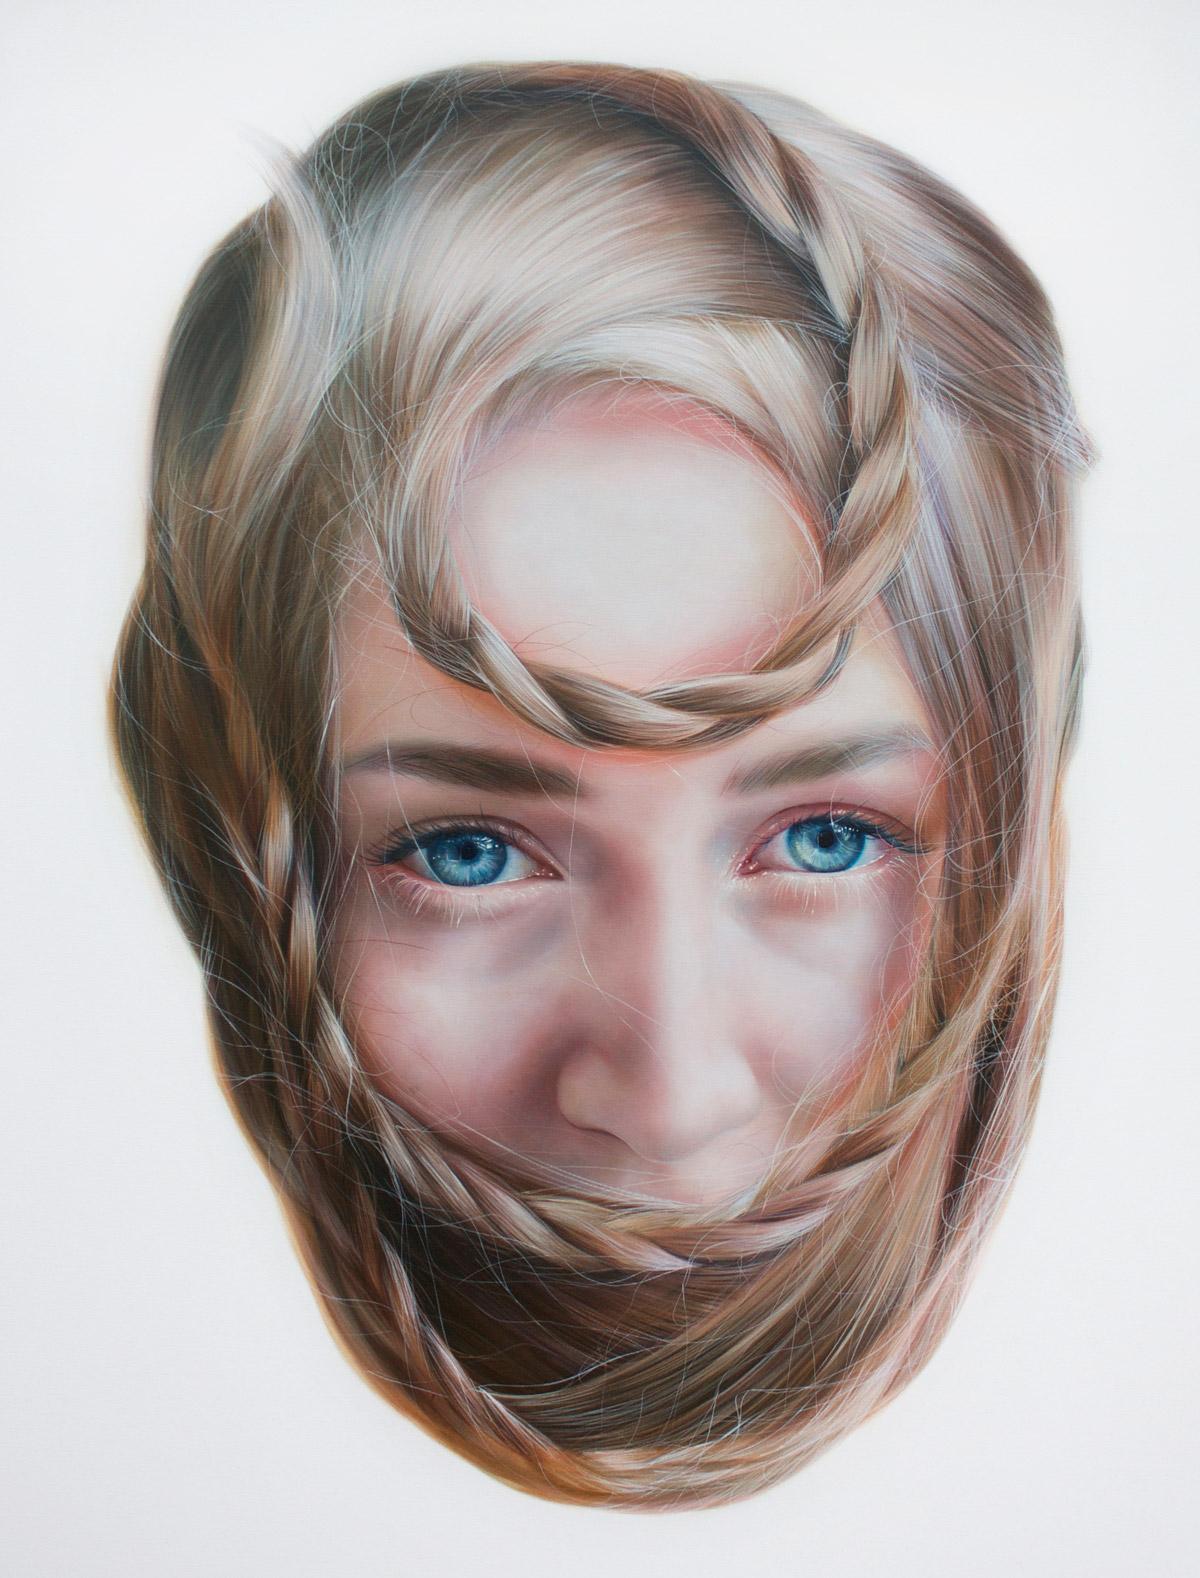 by Roos Van Der Vliet